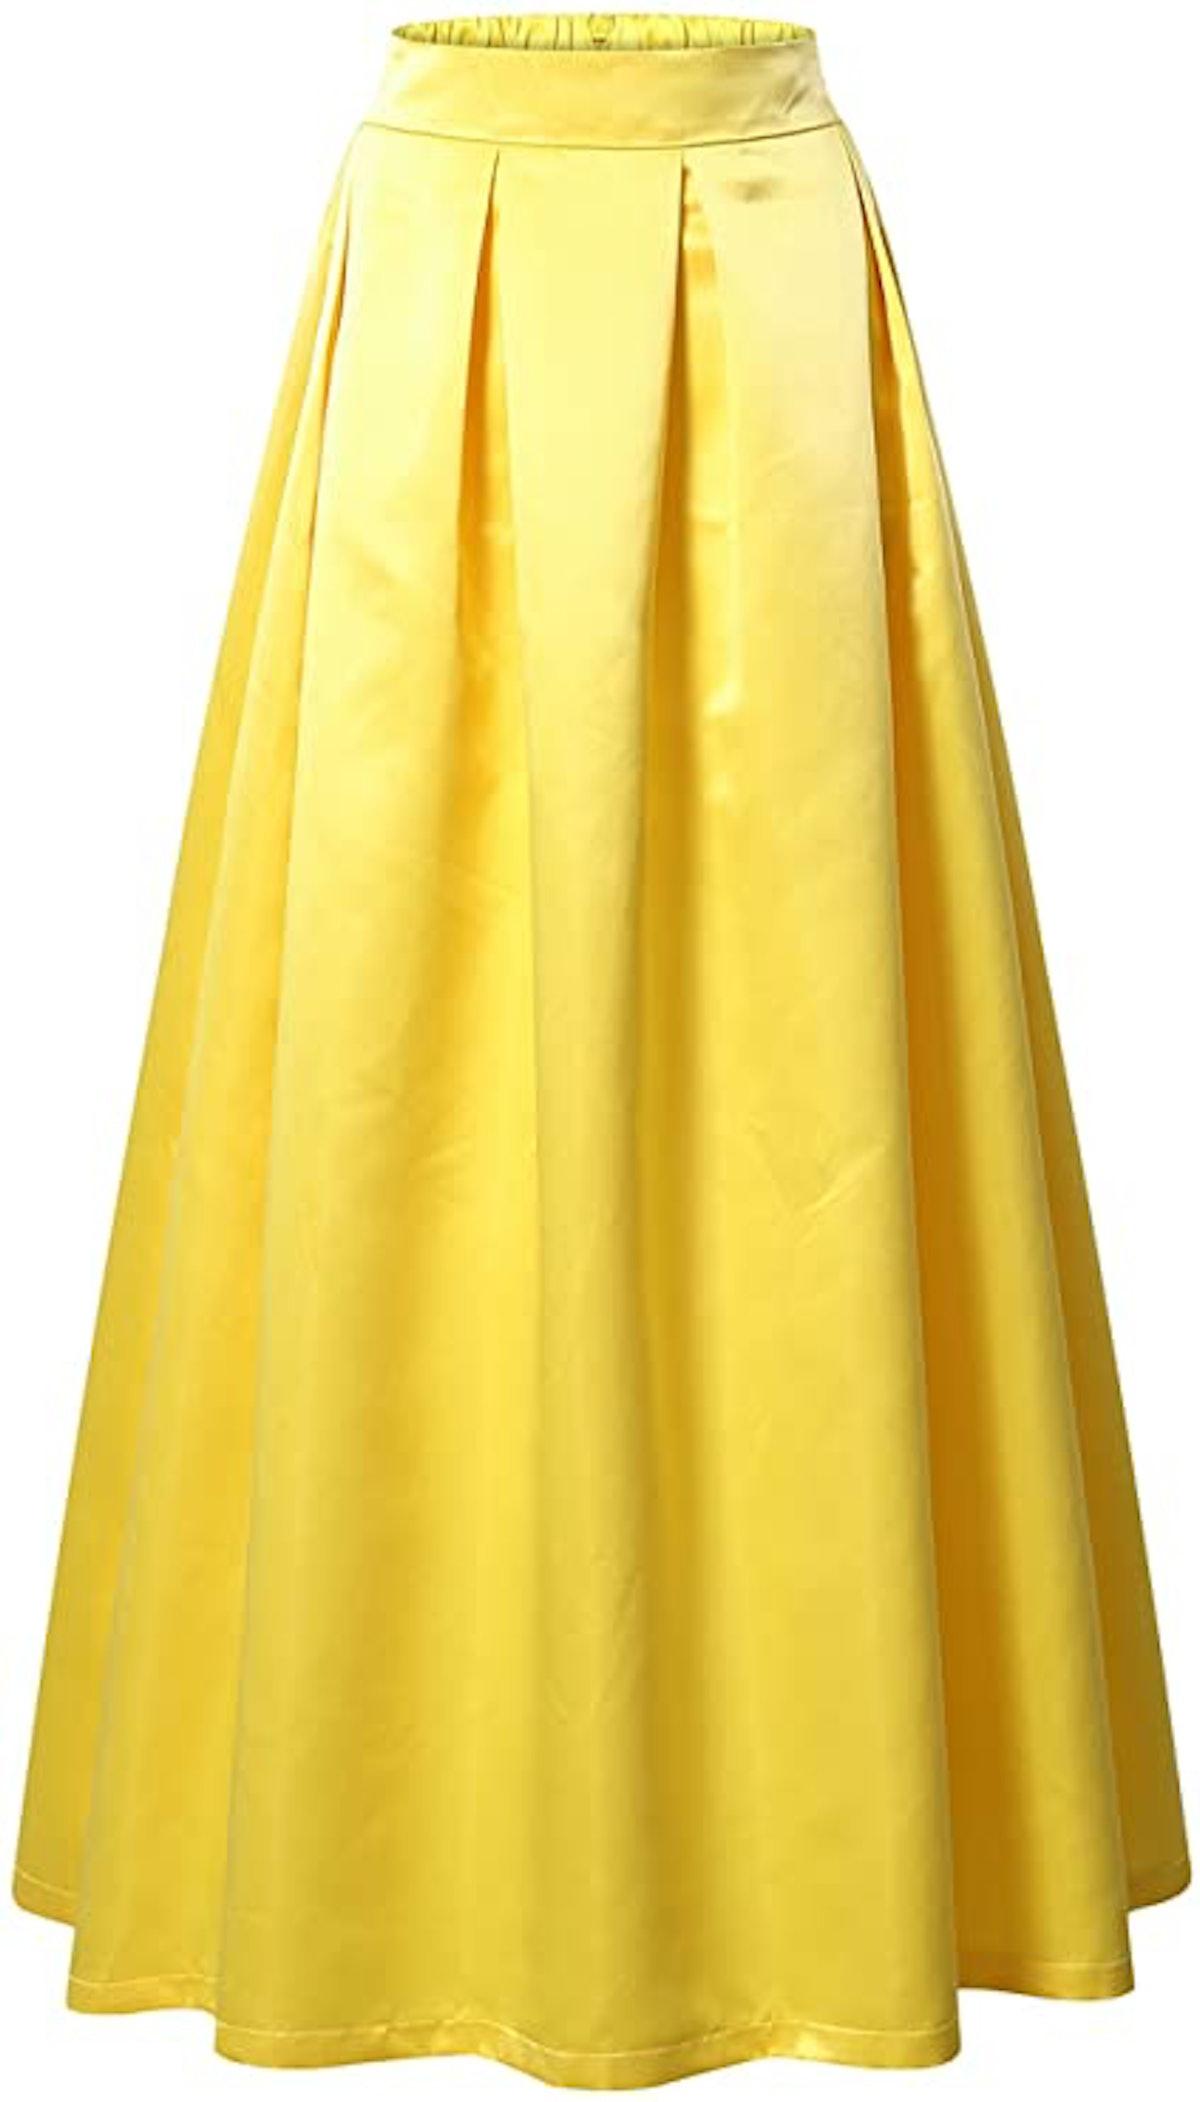 VETIOR Women's Elastic High Waist A-line Flared Maxi Skirt